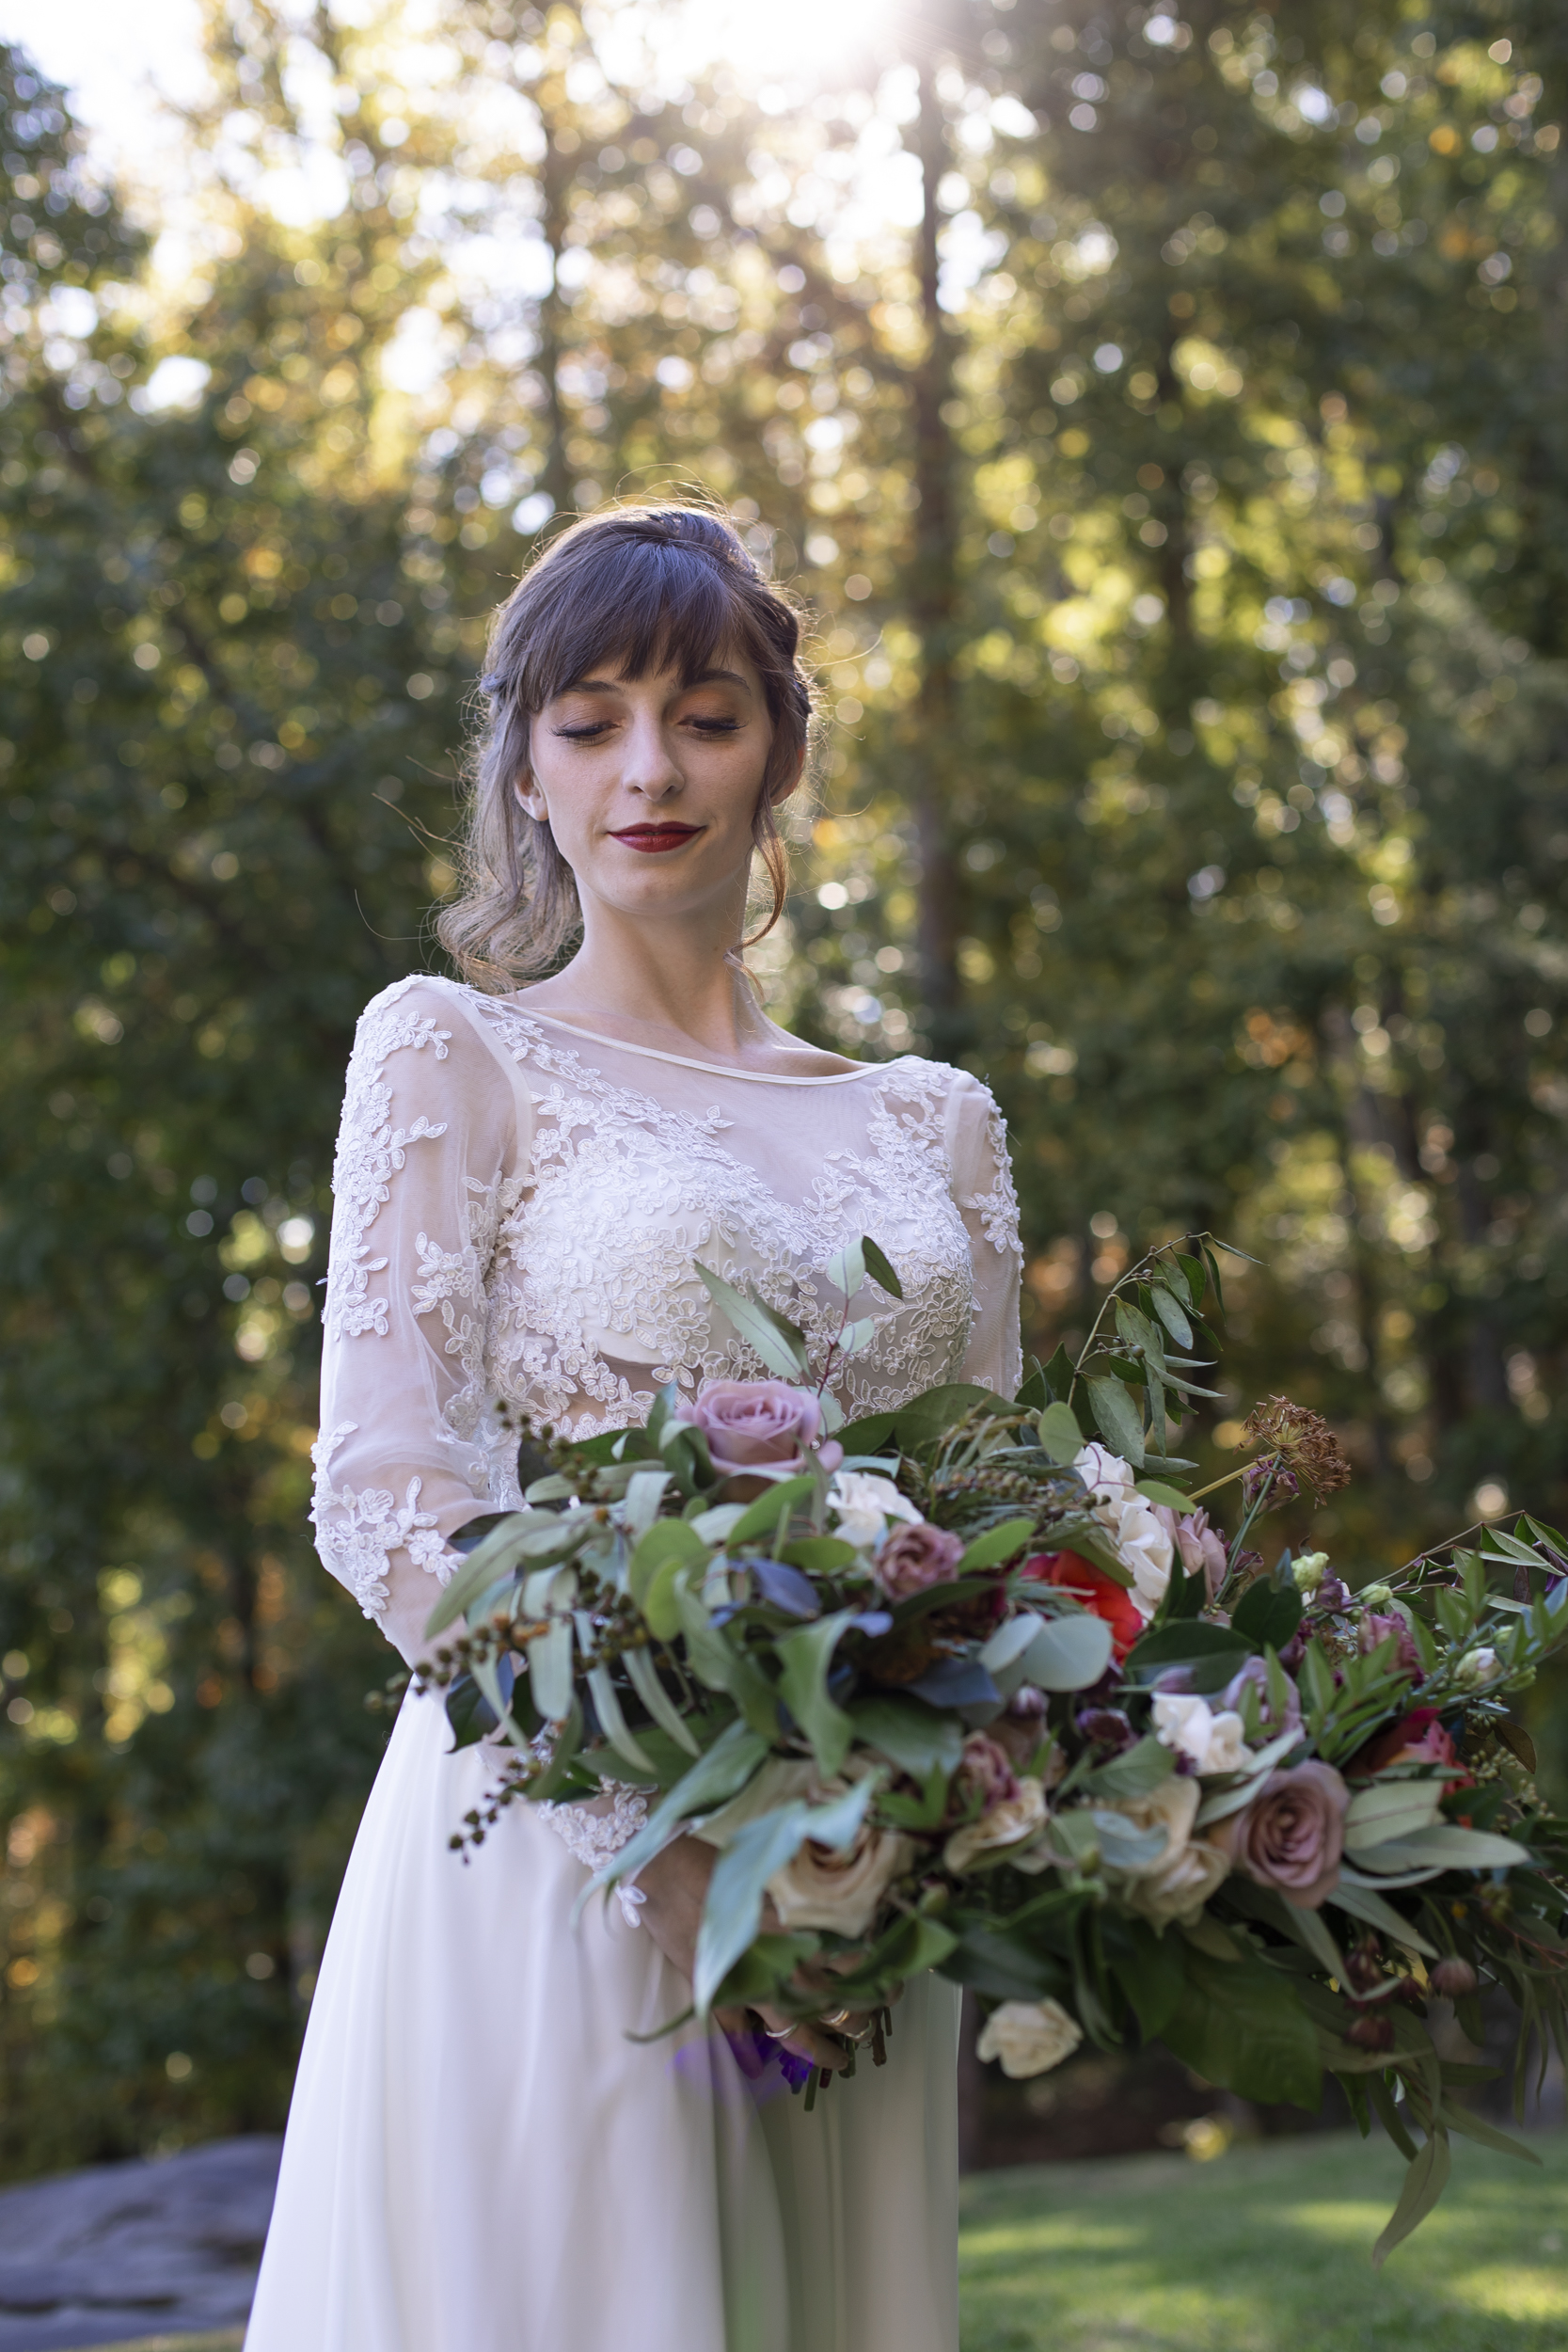 Laurel Falls Wedding October 2018_Allison and Josh__Lola Salon_Flora_Photo by Studio Misha Photography-26.jpg